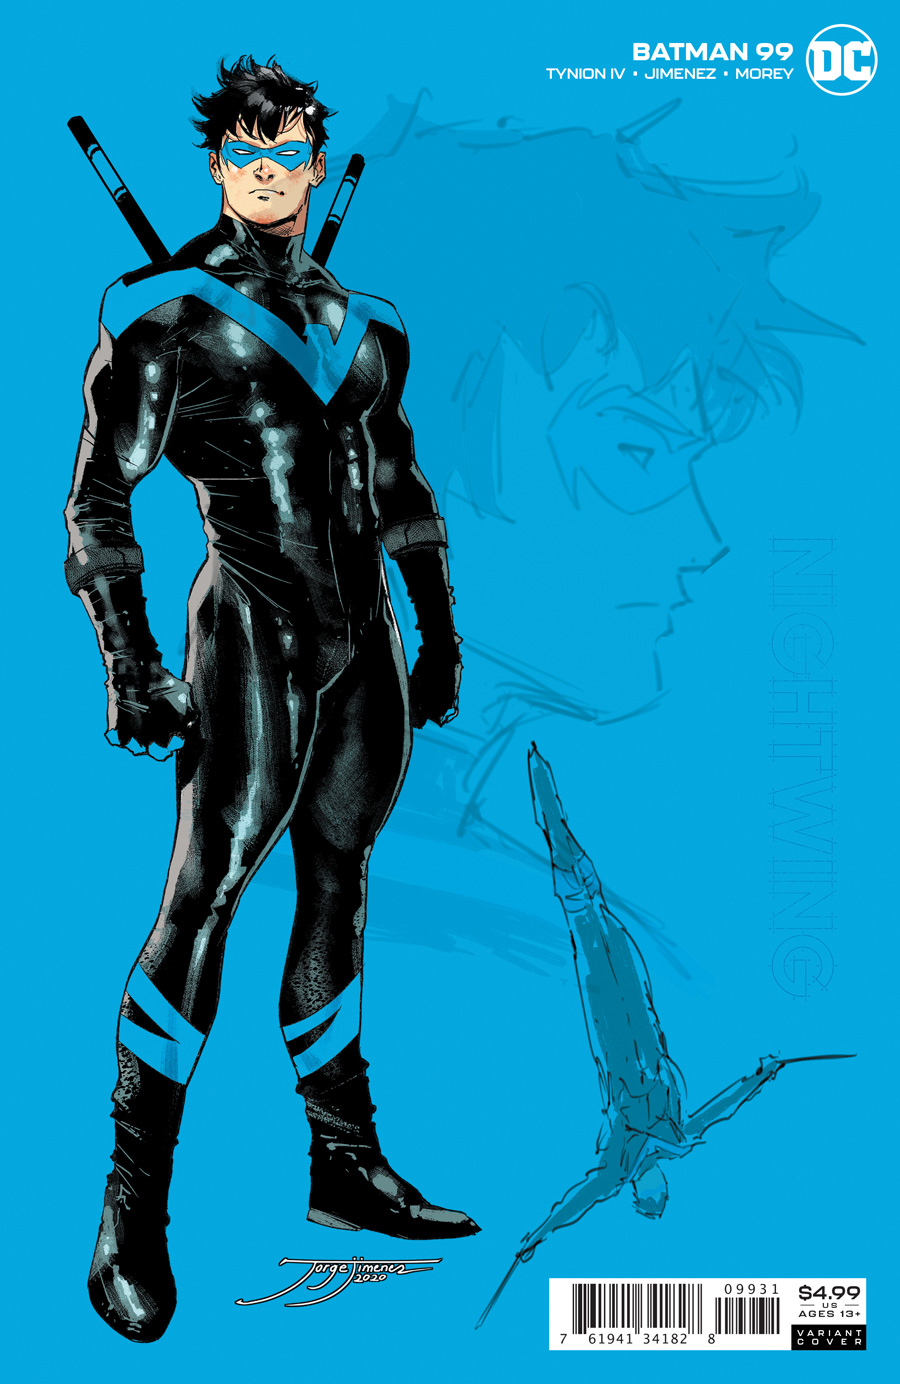 Batman Vol 3 #99 Cover C 1:25 Jorge Jimenez Nightwing Variant